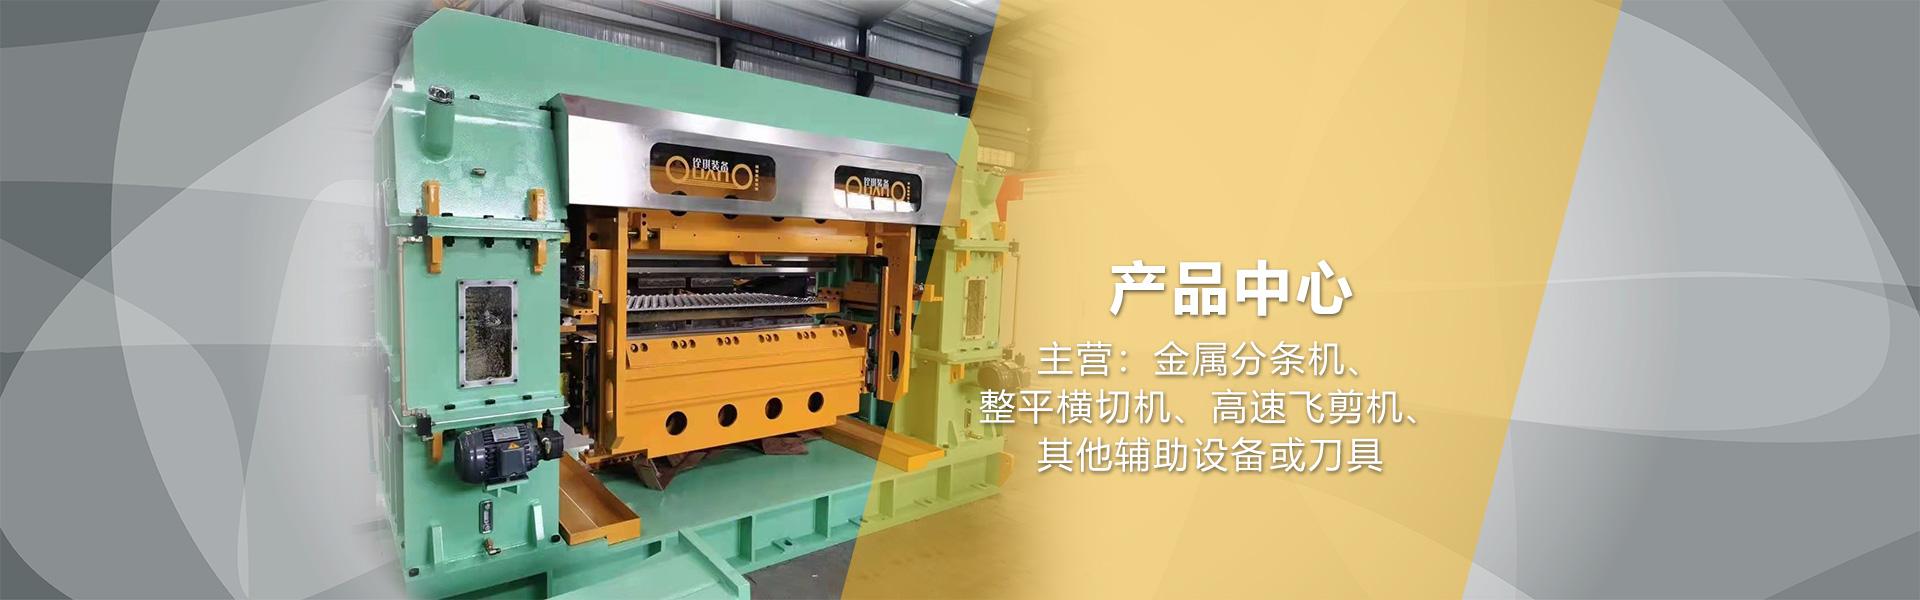 http://www.chinaquanqi.com/data/upload/202101/20210129180624_138.jpg